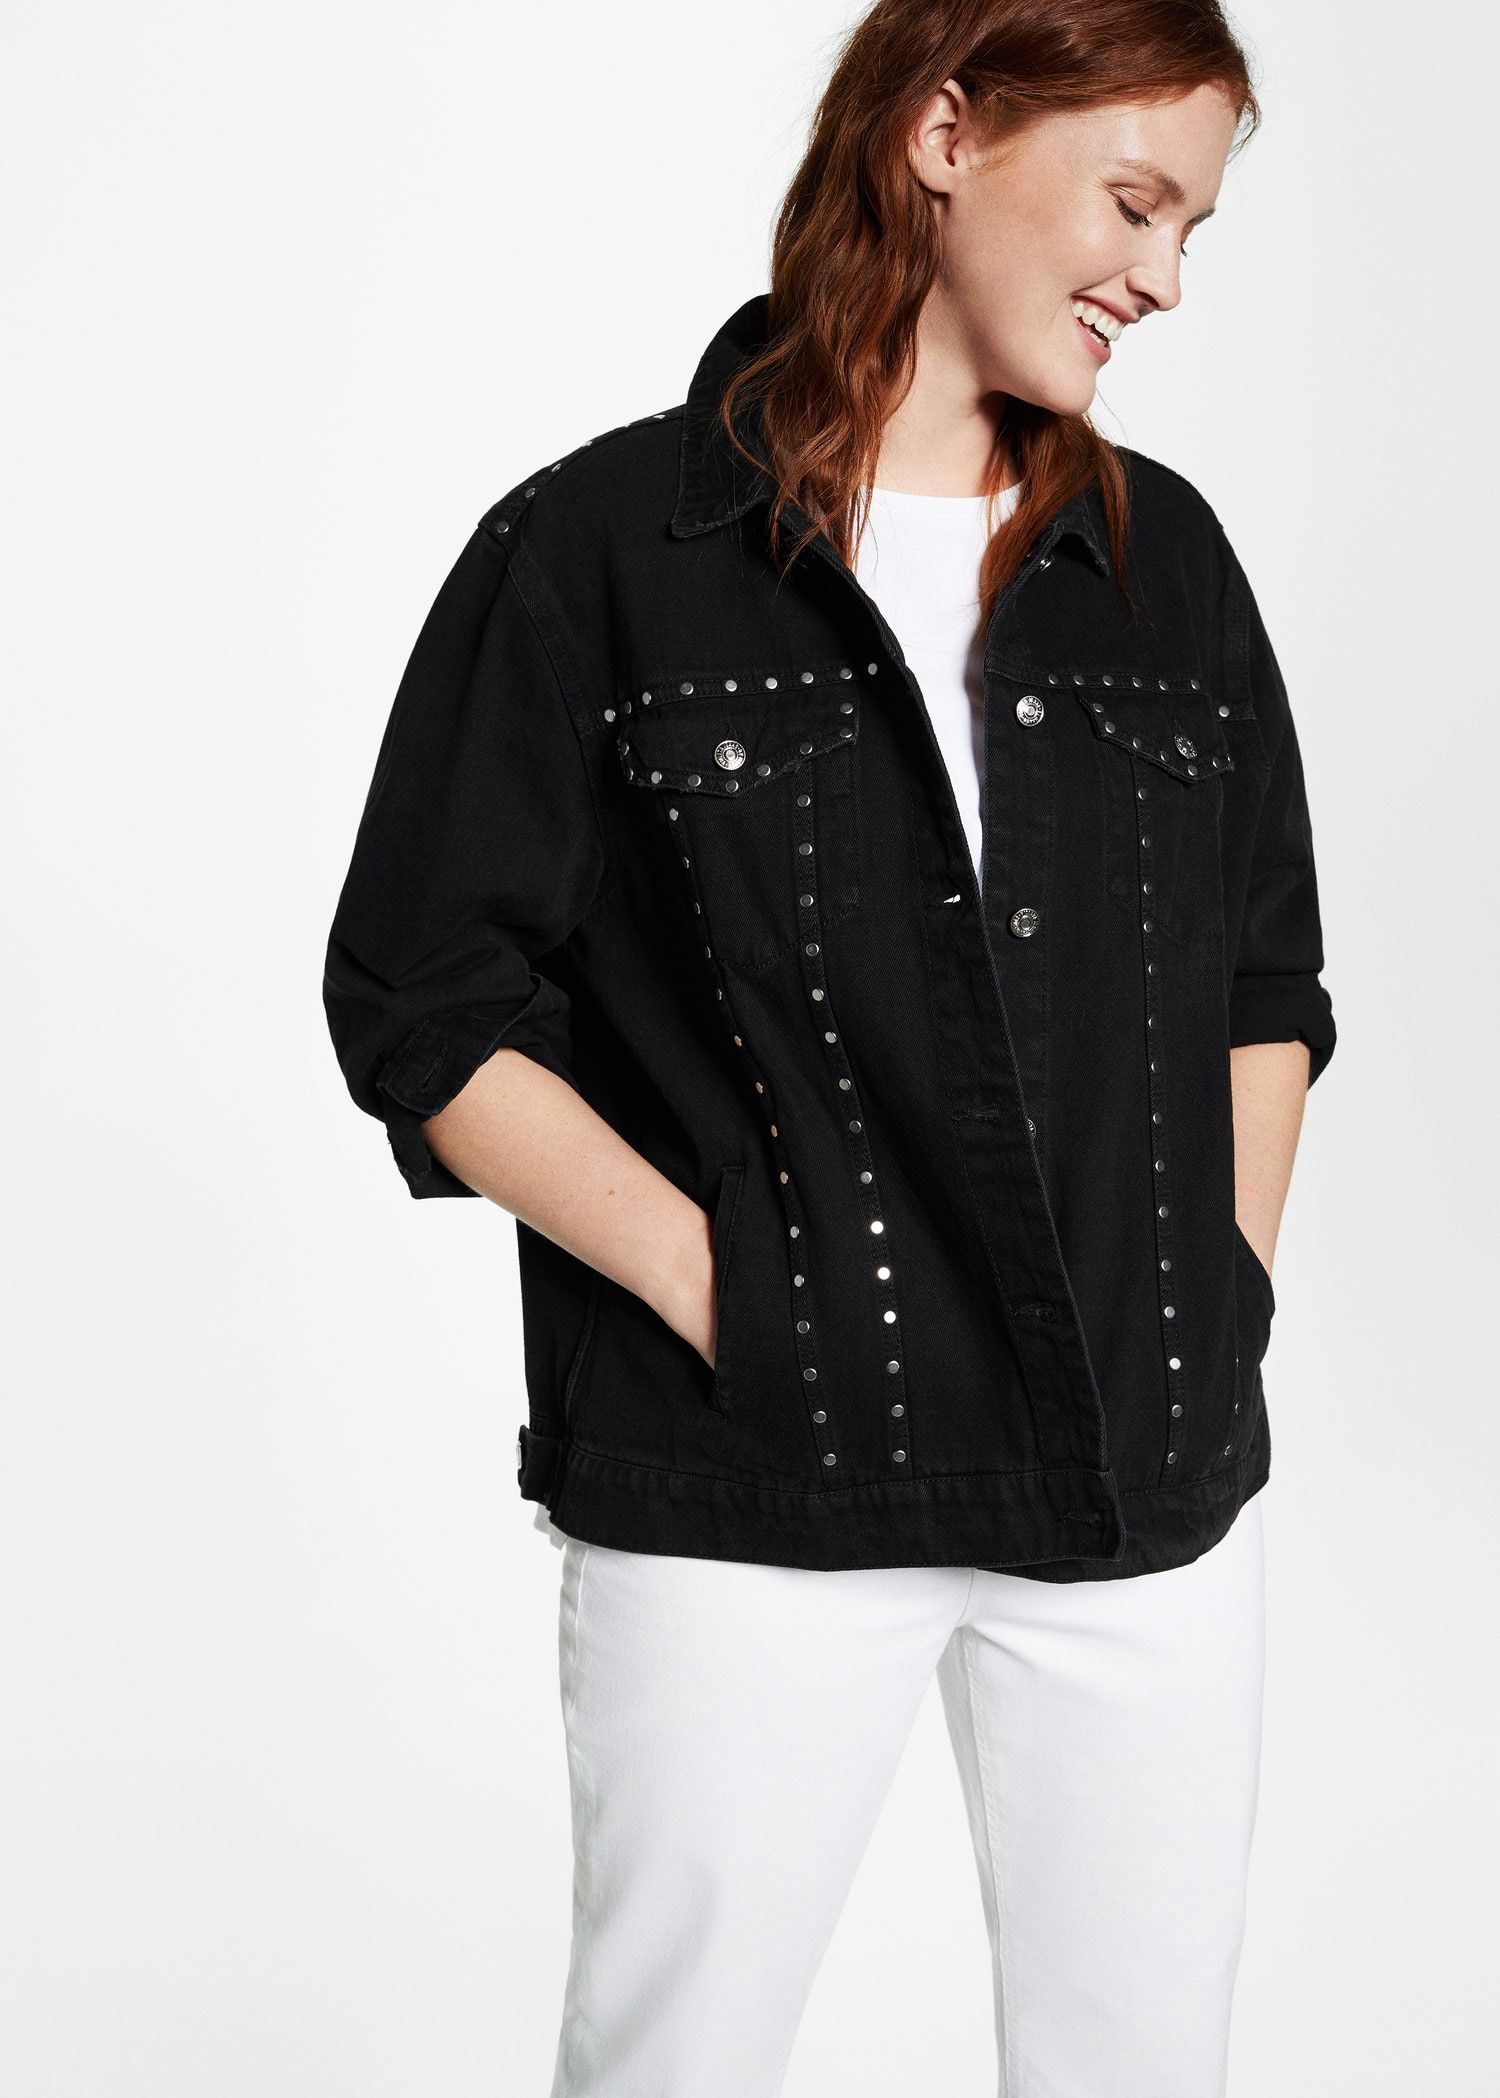 acf6285cce Mango Studded Denim Jacket - Plus Sizes | Violeta By XS | Products ...